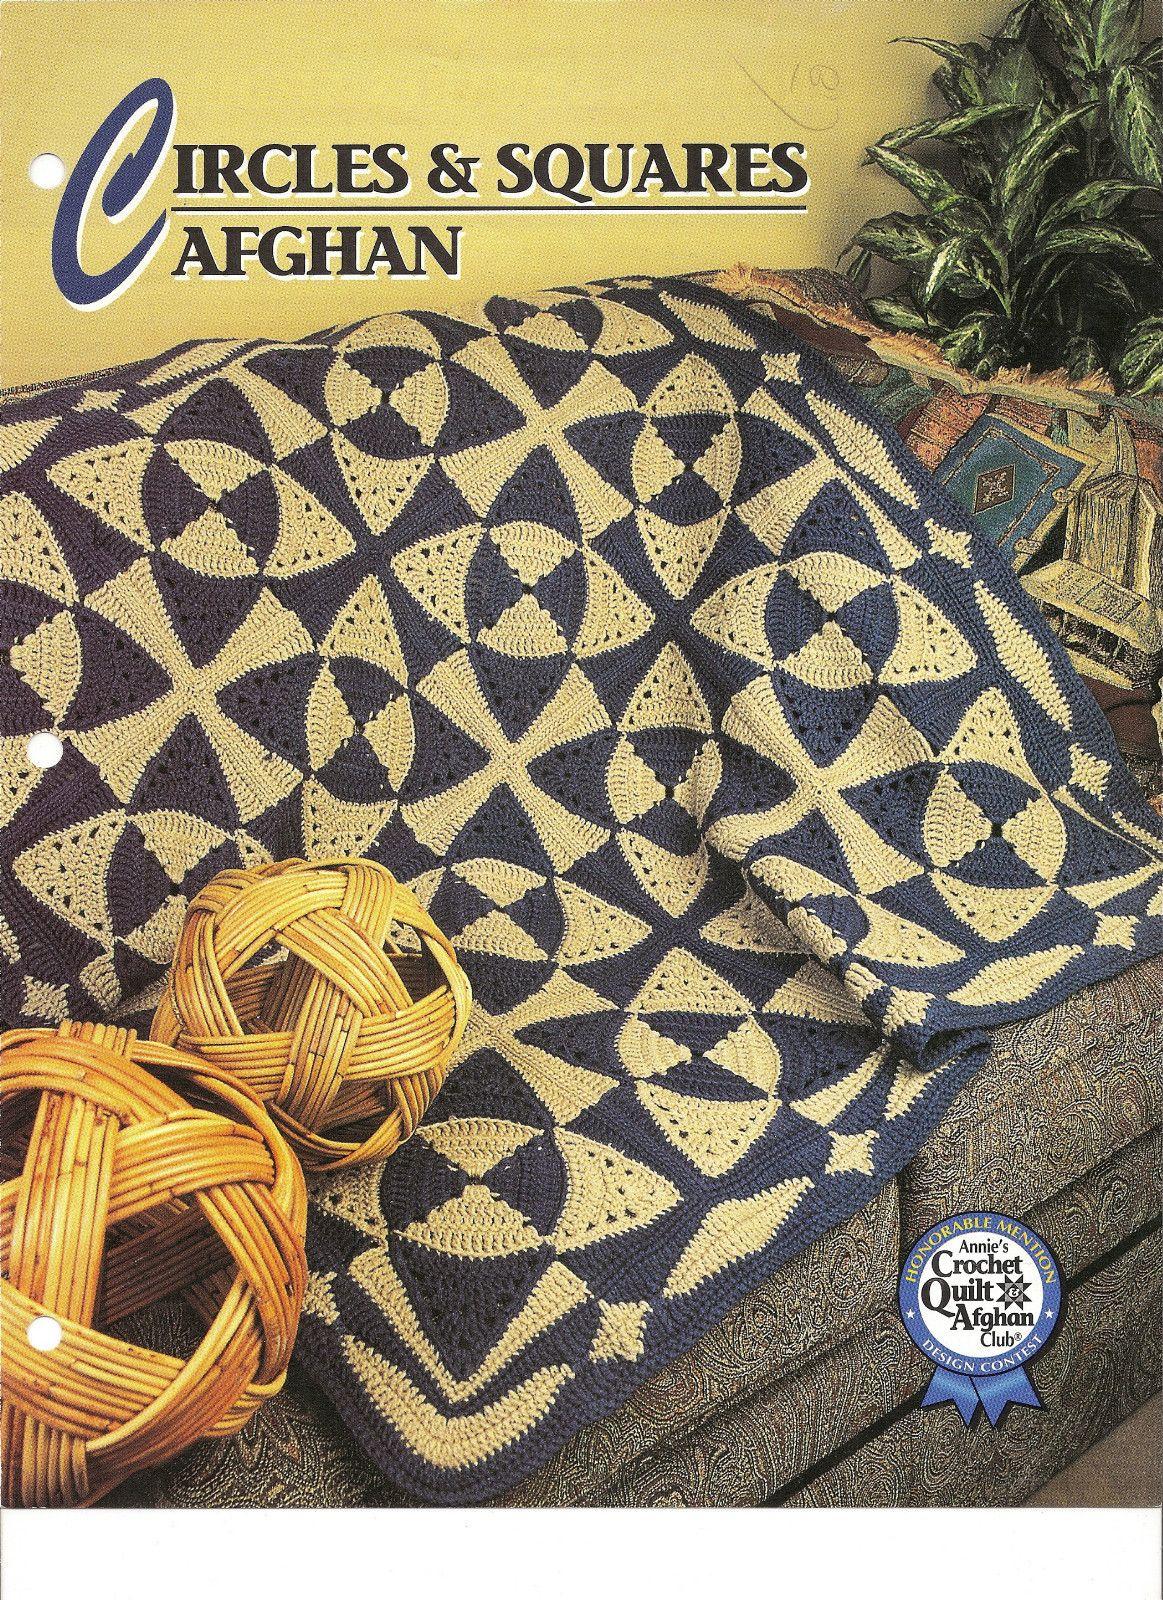 Circles Squares Afghan Crochet Pattern Annies Attic Crochet Quilt